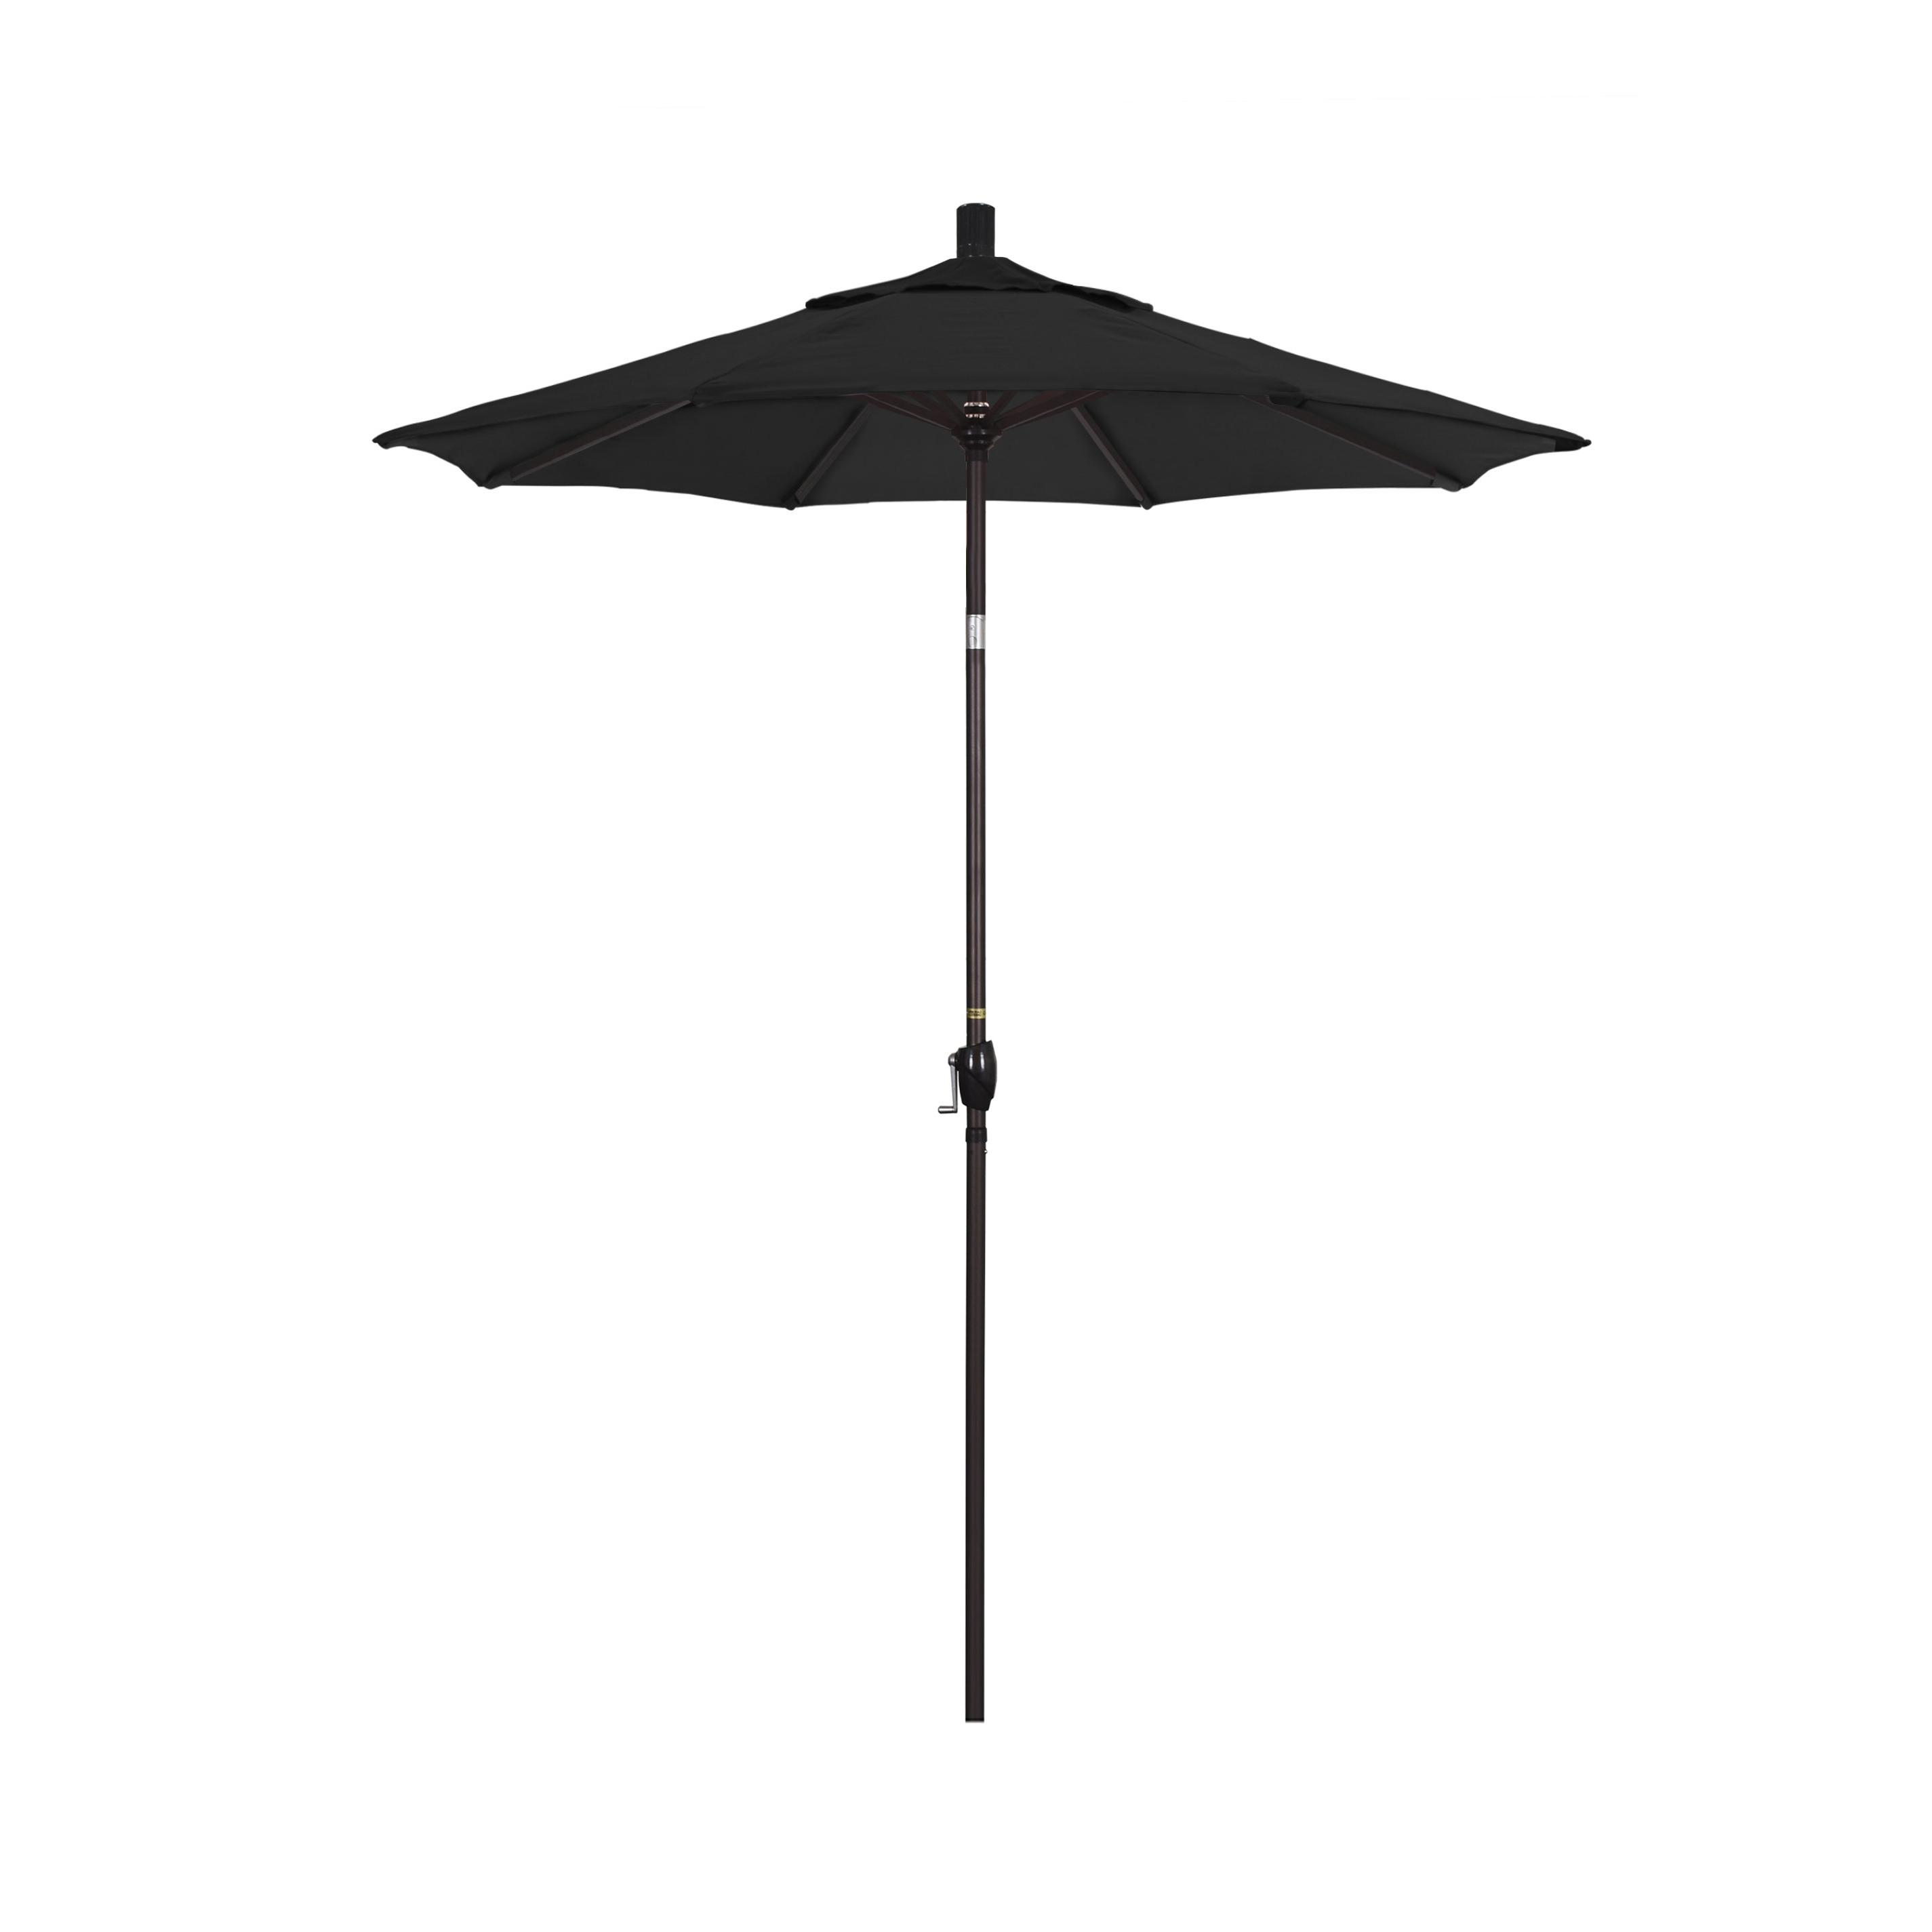 Popular Caravelle Square Market Sunbrella Umbrellas Within Wallach 6' Market Sunbrella Umbrella (Gallery 14 of 20)